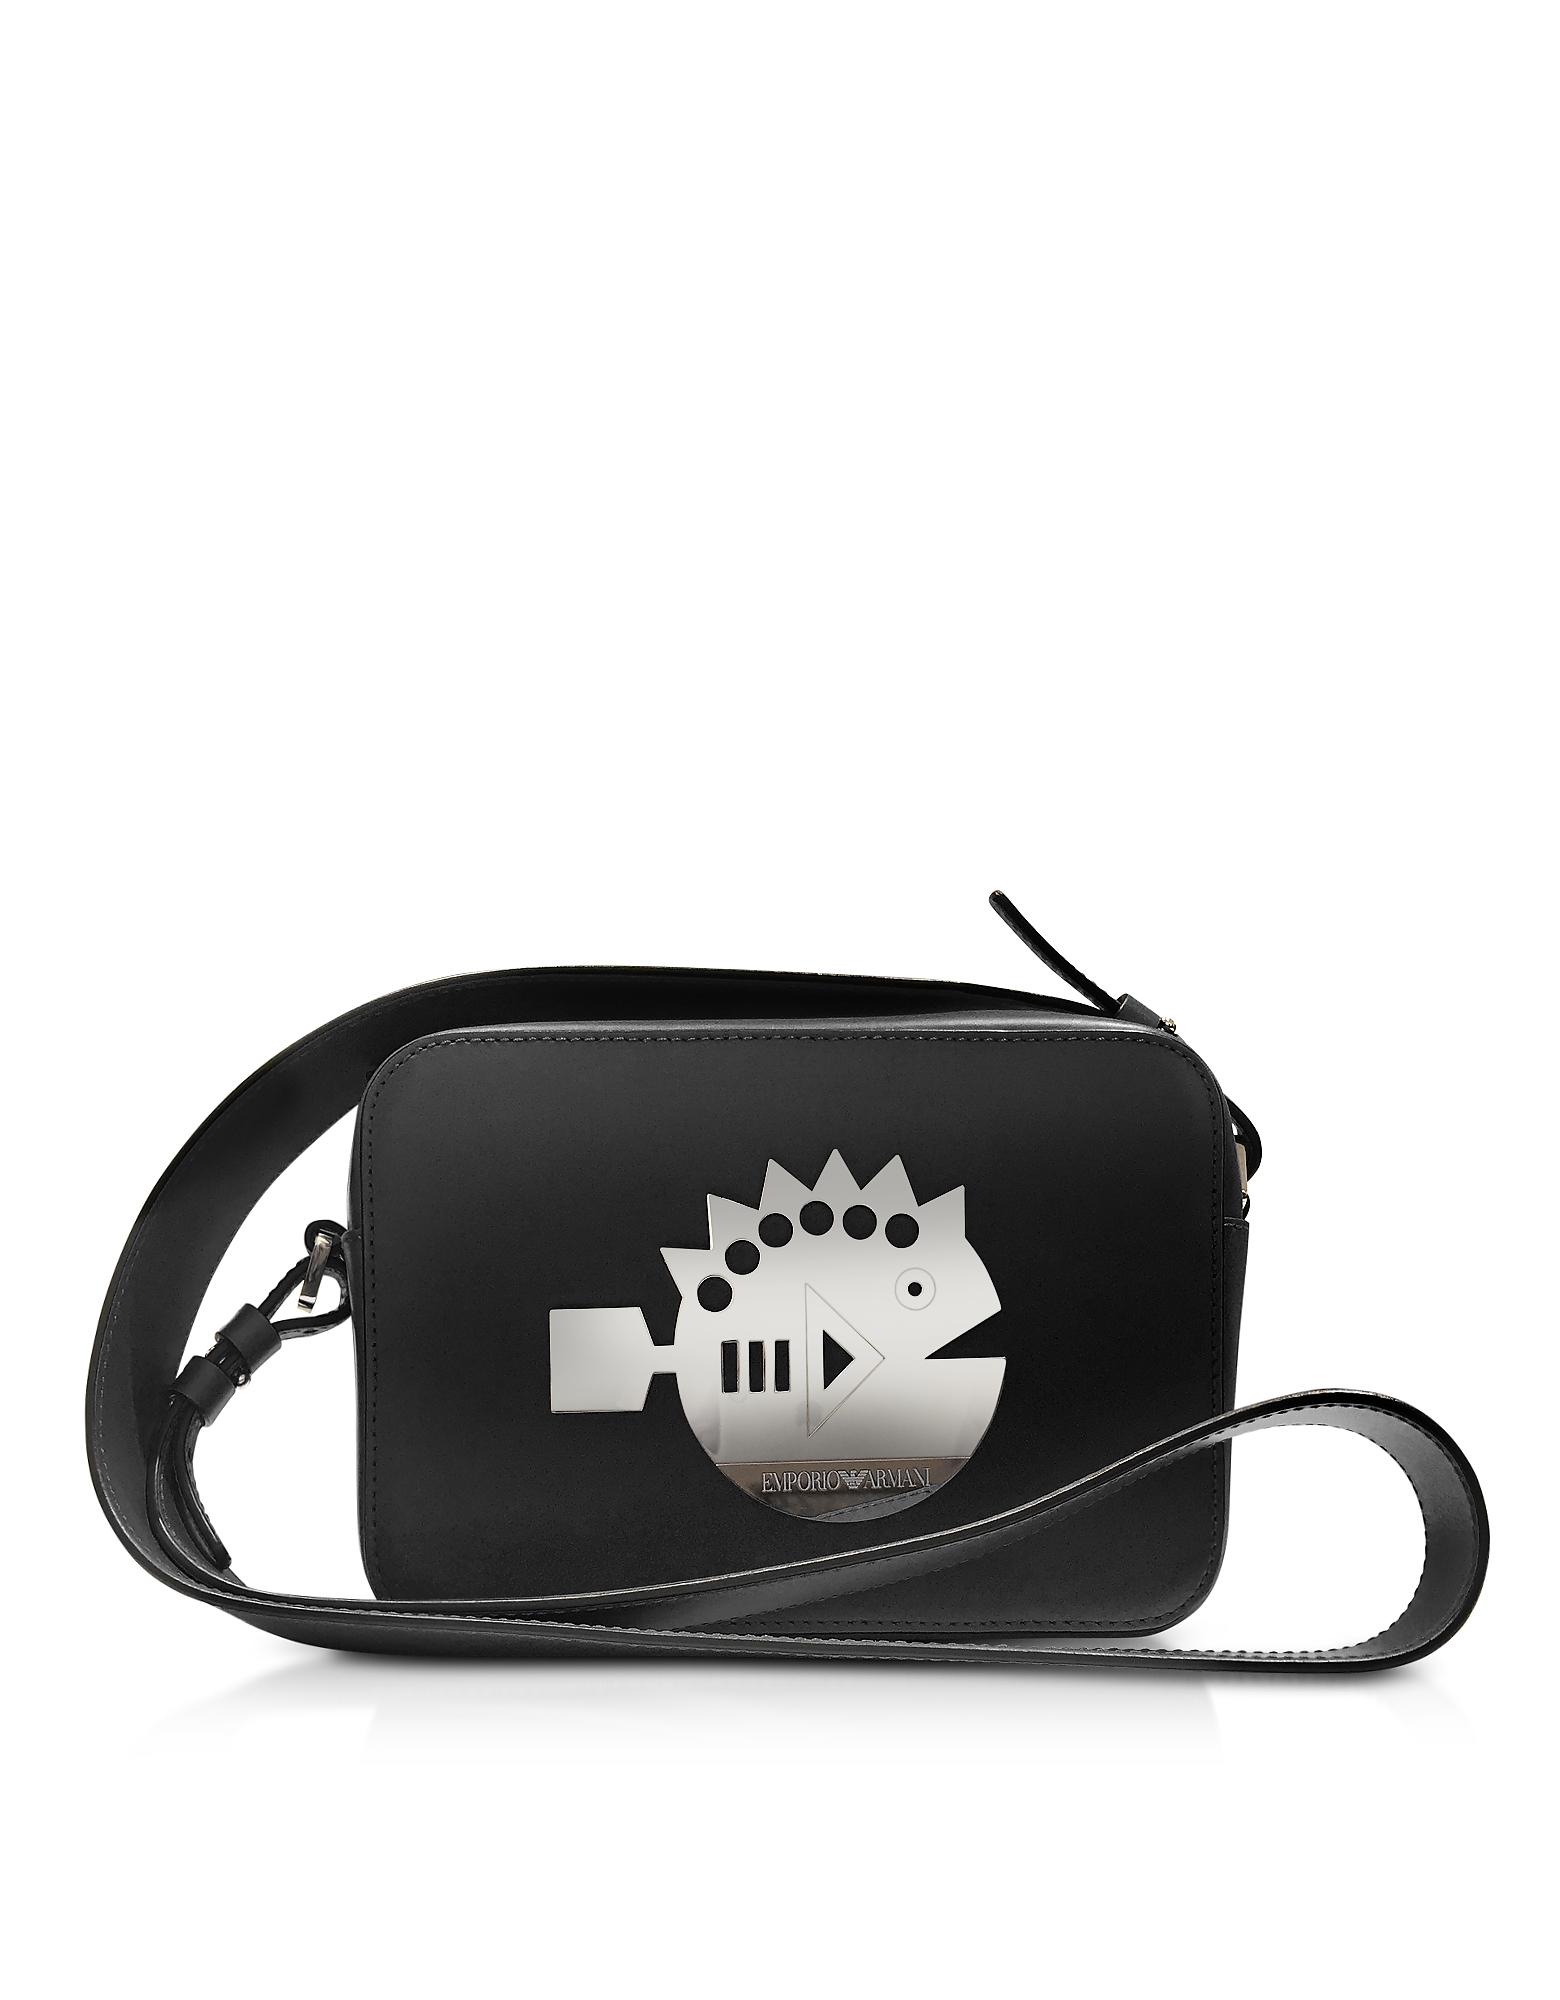 Cyber Waterworld Leather Crossbody Bag